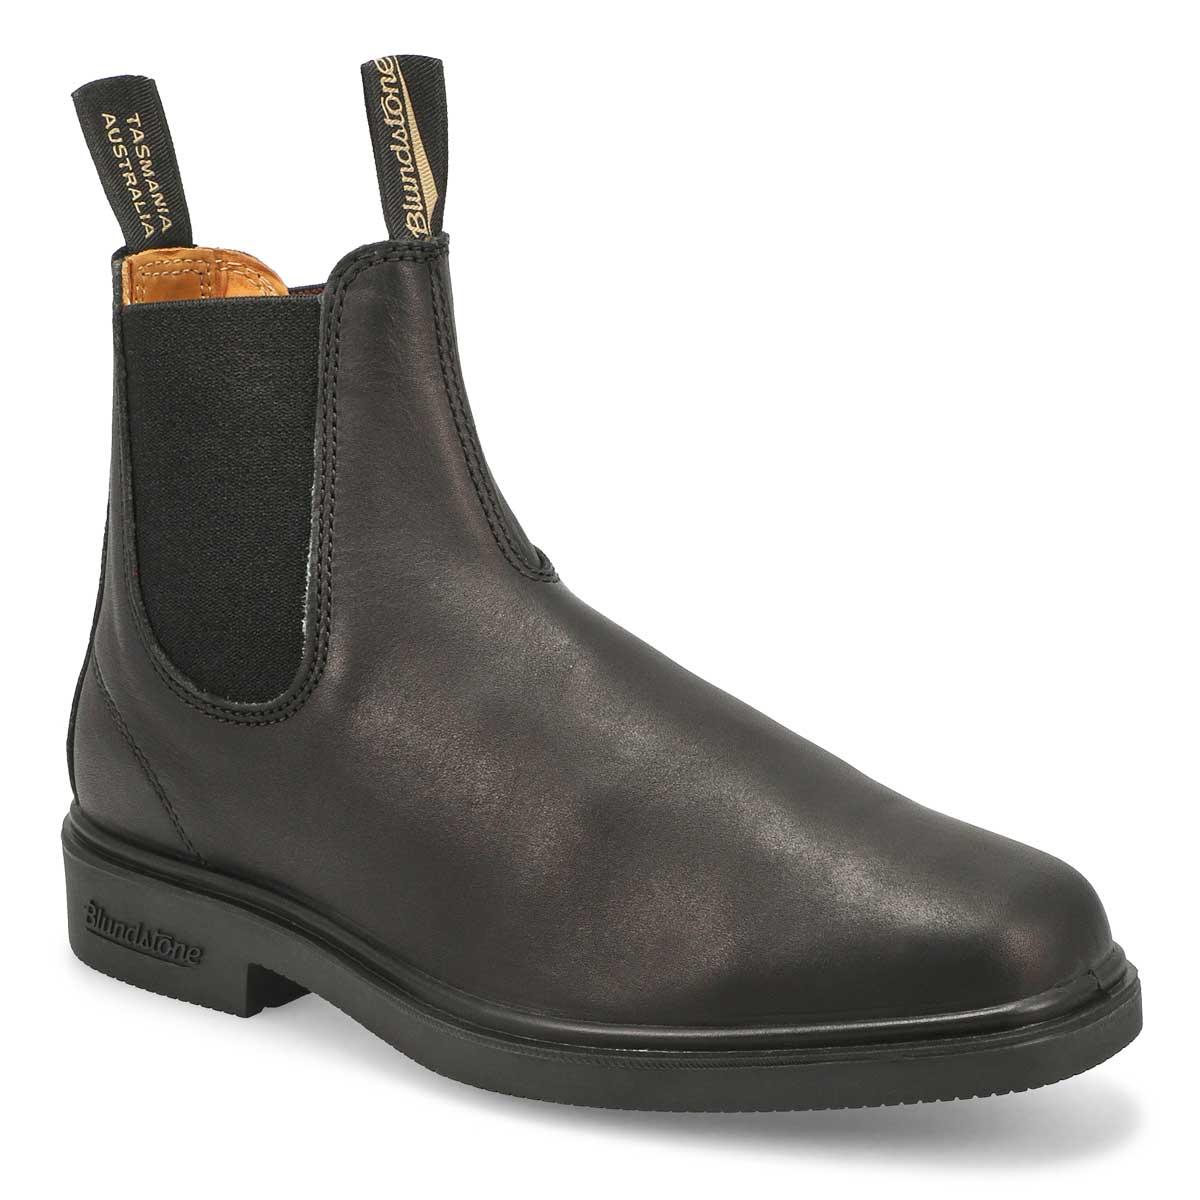 Unisex Chisel Toe blk twin gore boot